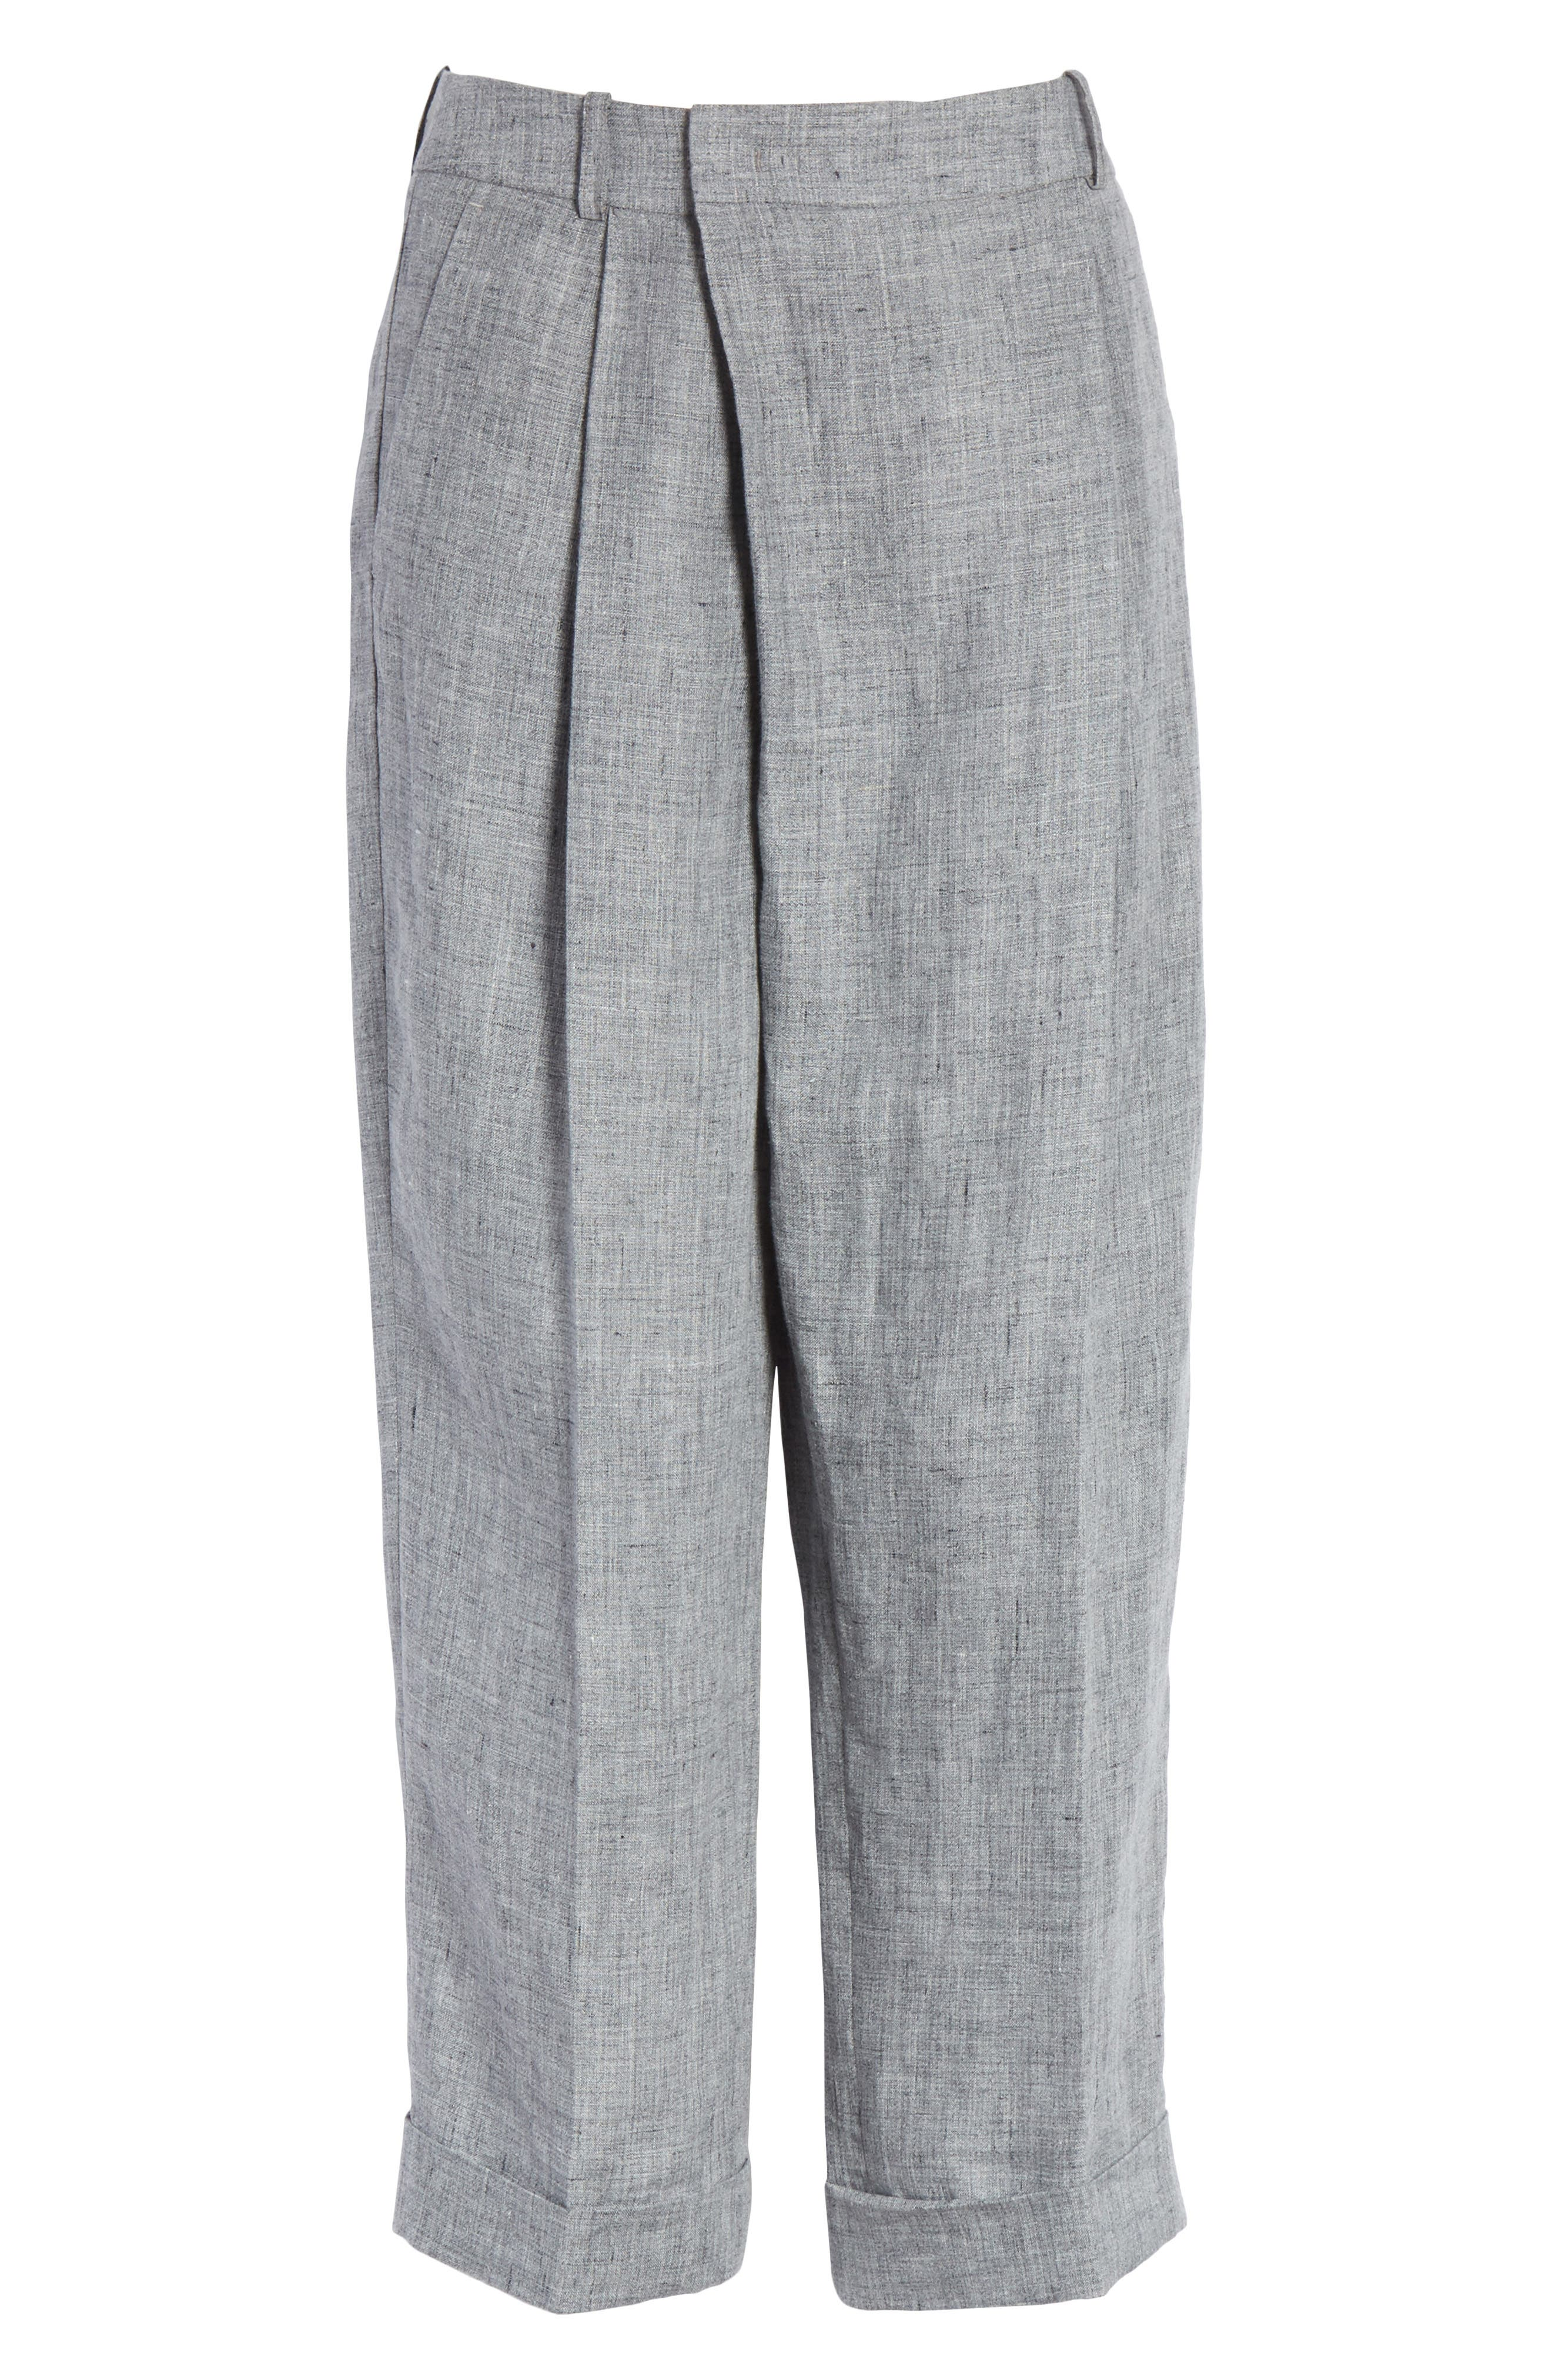 Cross Front Linen Crop Trousers,                             Alternate thumbnail 7, color,                             Banker Melange